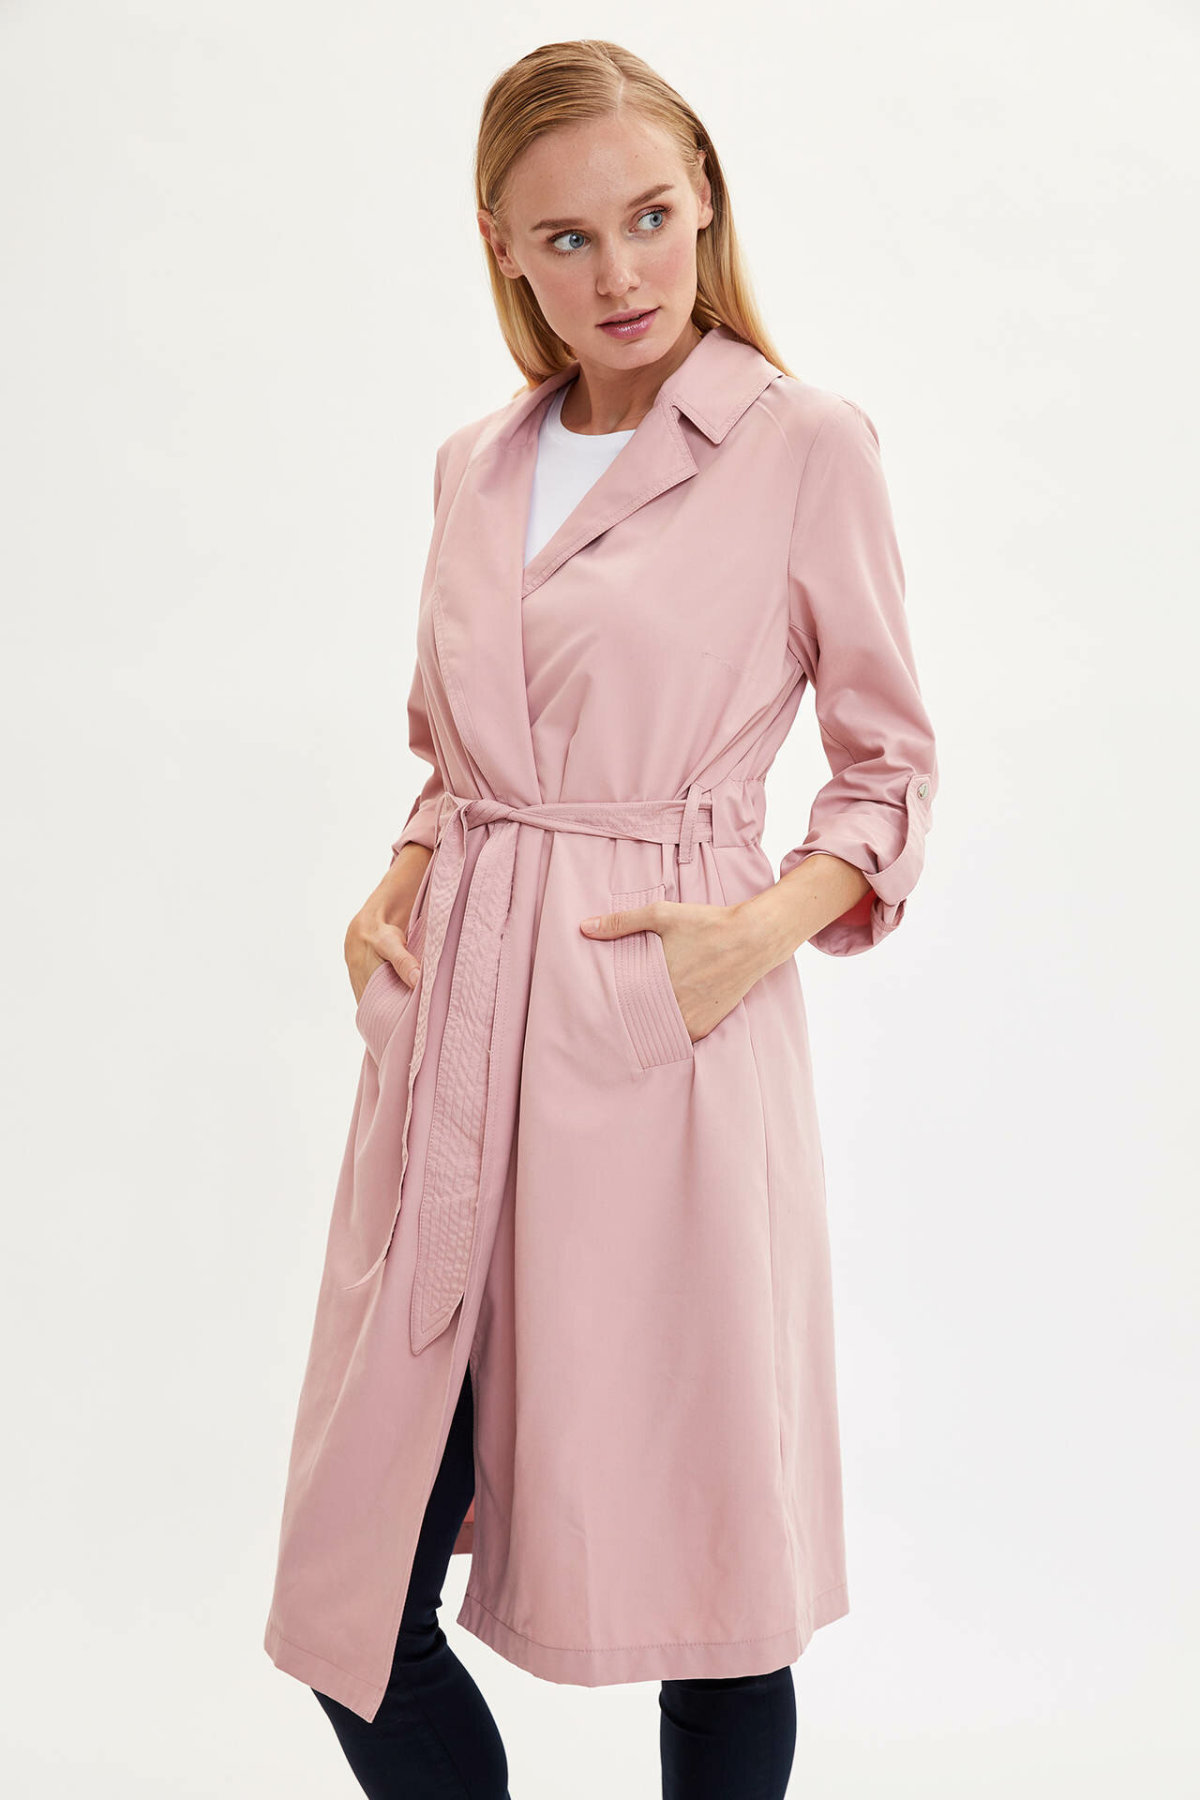 DeFacto Woman Autumn Long Trenchcoat Pink Red Color Women Windbreaker Female Classic Windcoats Tops-K8006AZ19AU